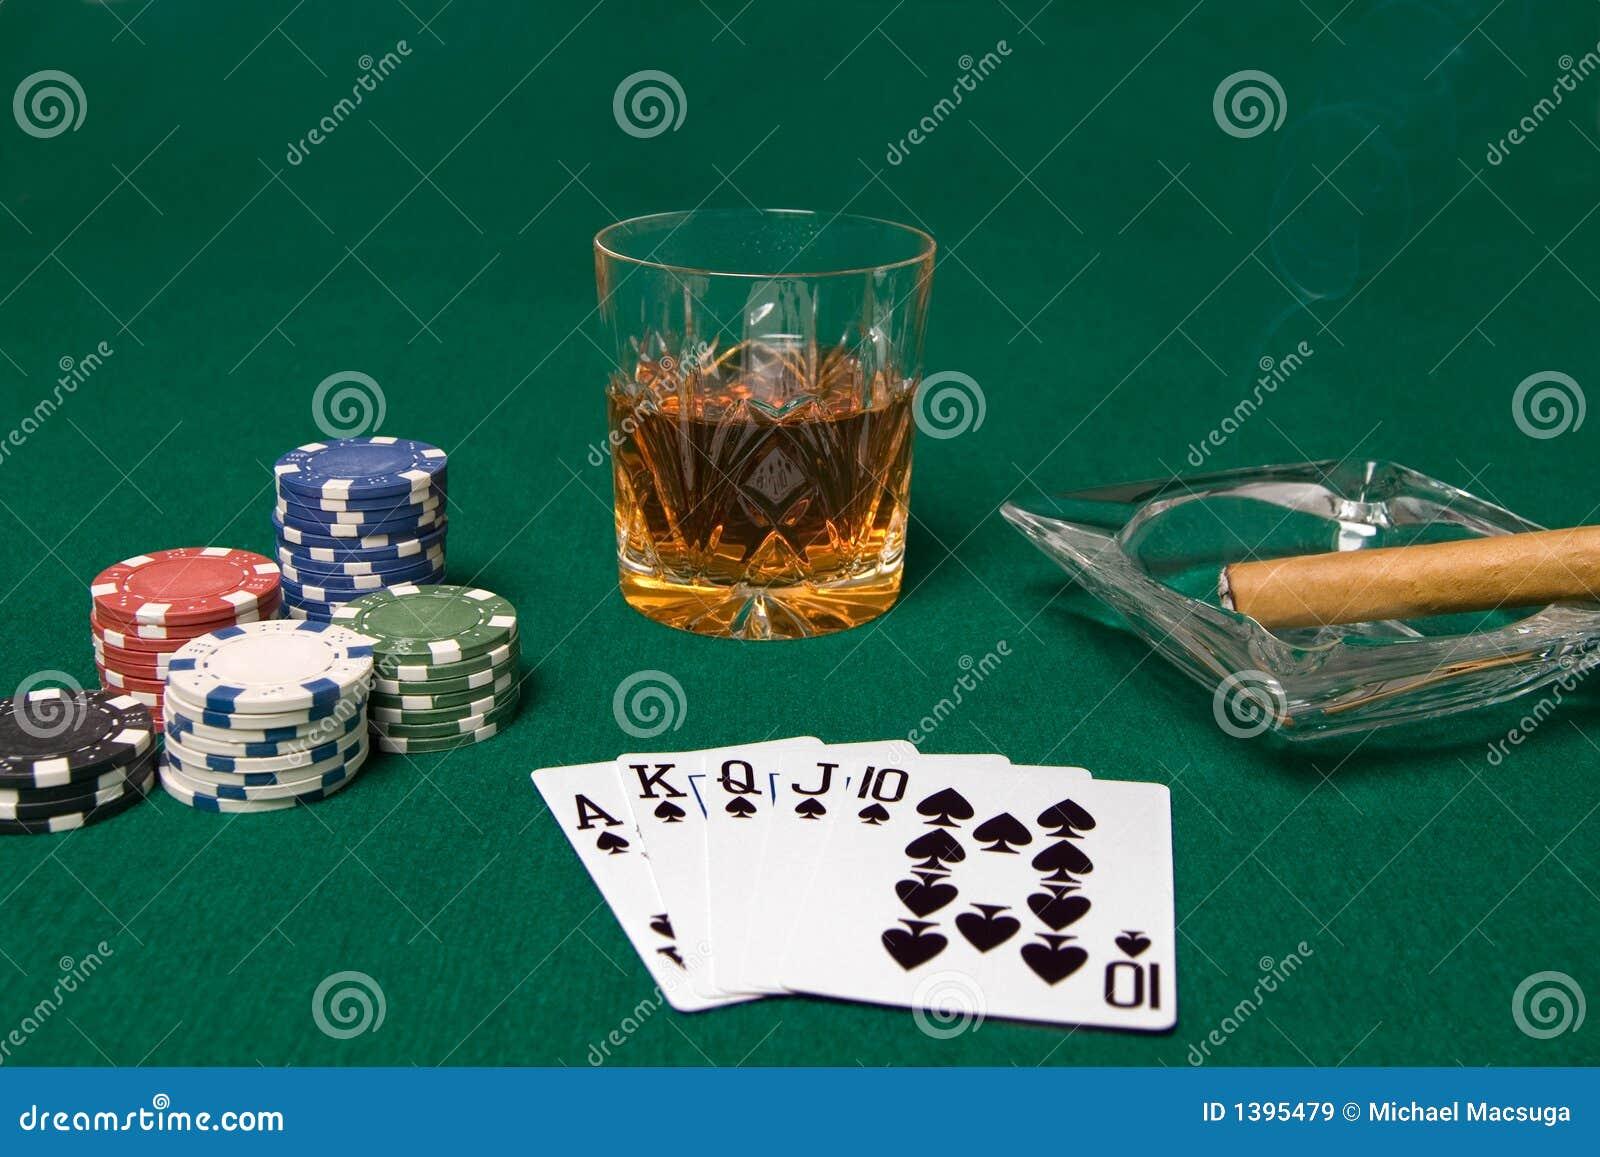 free casino online casino holidays